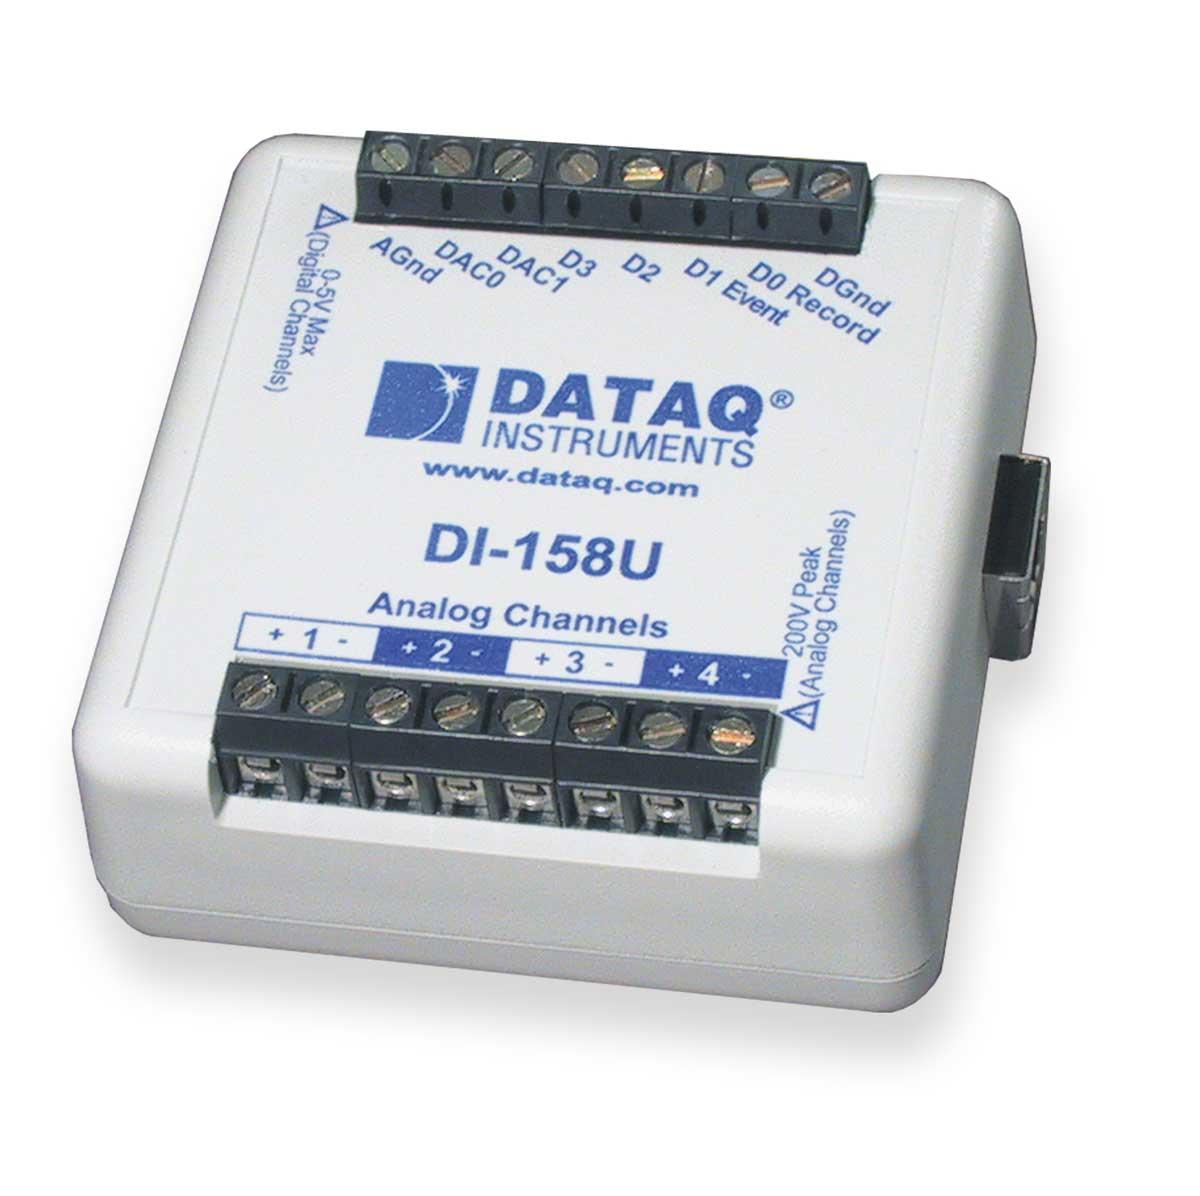 http://www.dataq.com/images/products/starterkits/158u.jpg